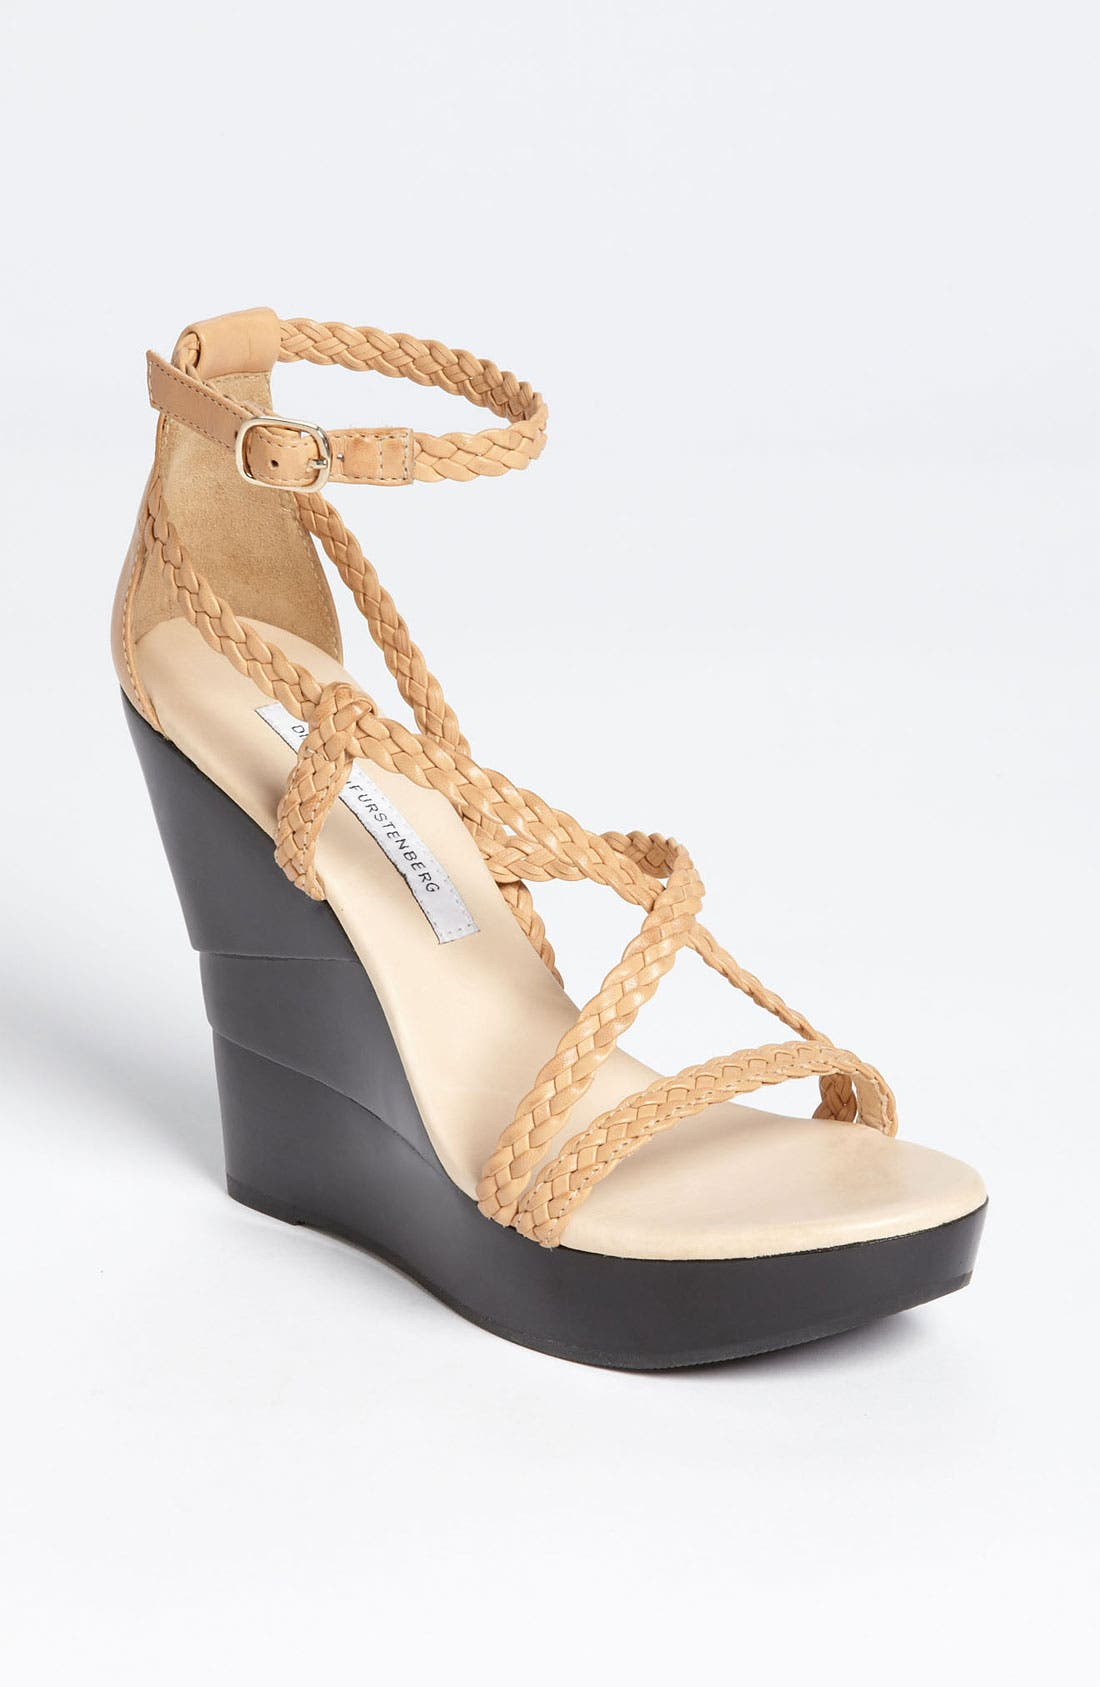 Main Image - Diane von Furstenberg 'Olive' Wedge Sandal (Online Only)